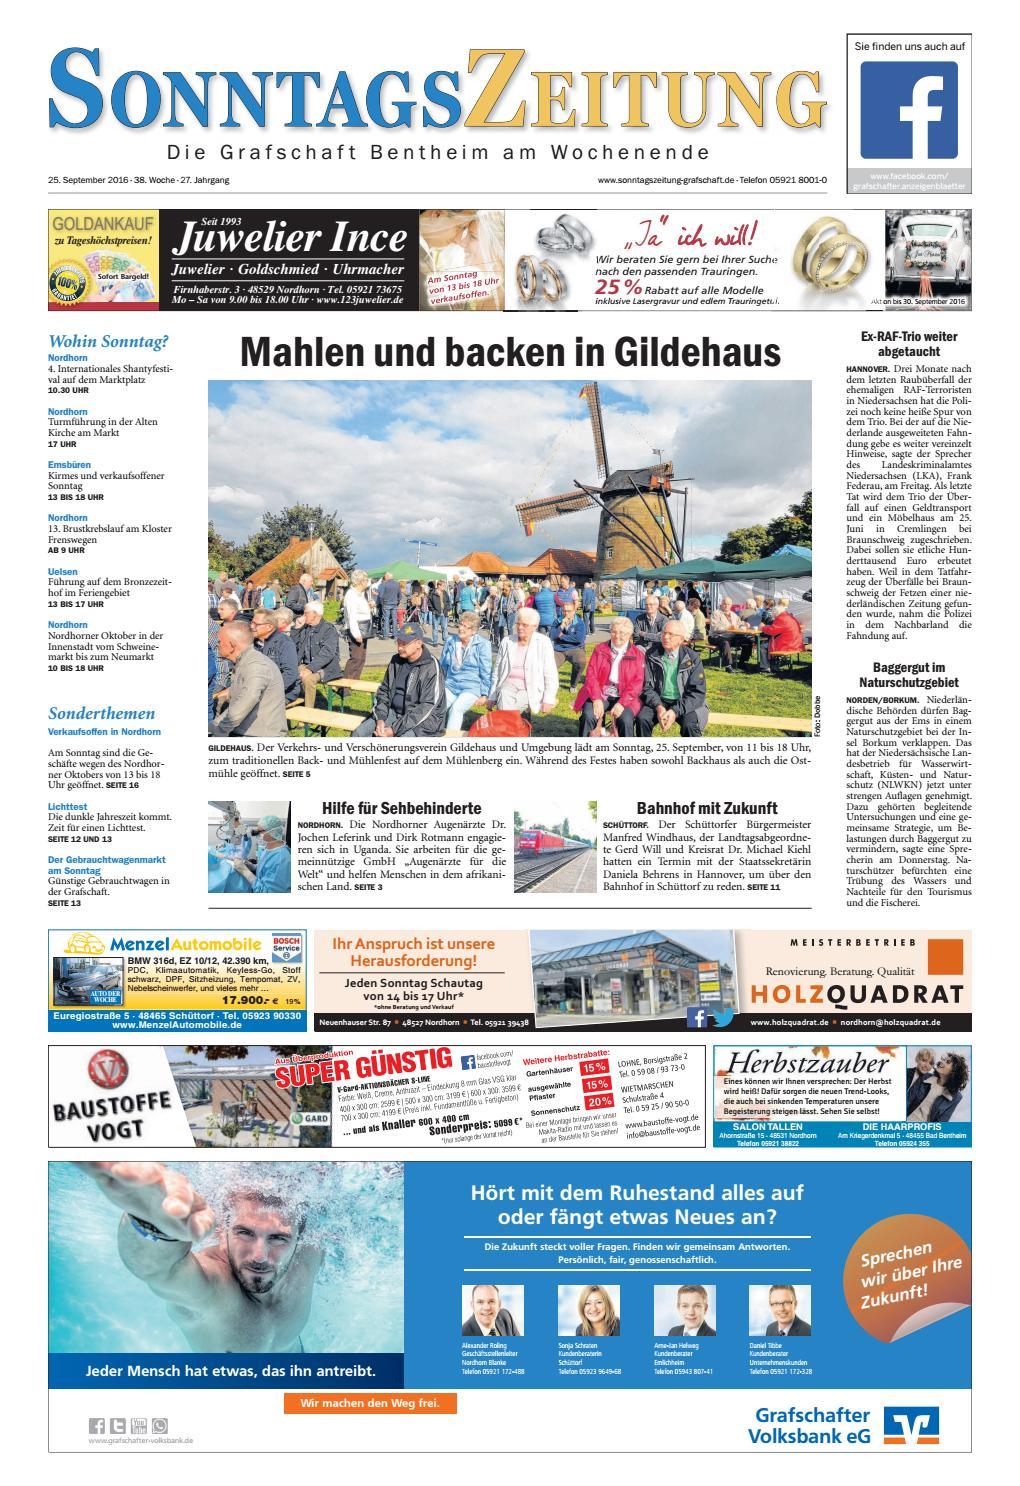 SonntagsZeitung_25-09-2016 by SonntagsZeitung - issuu